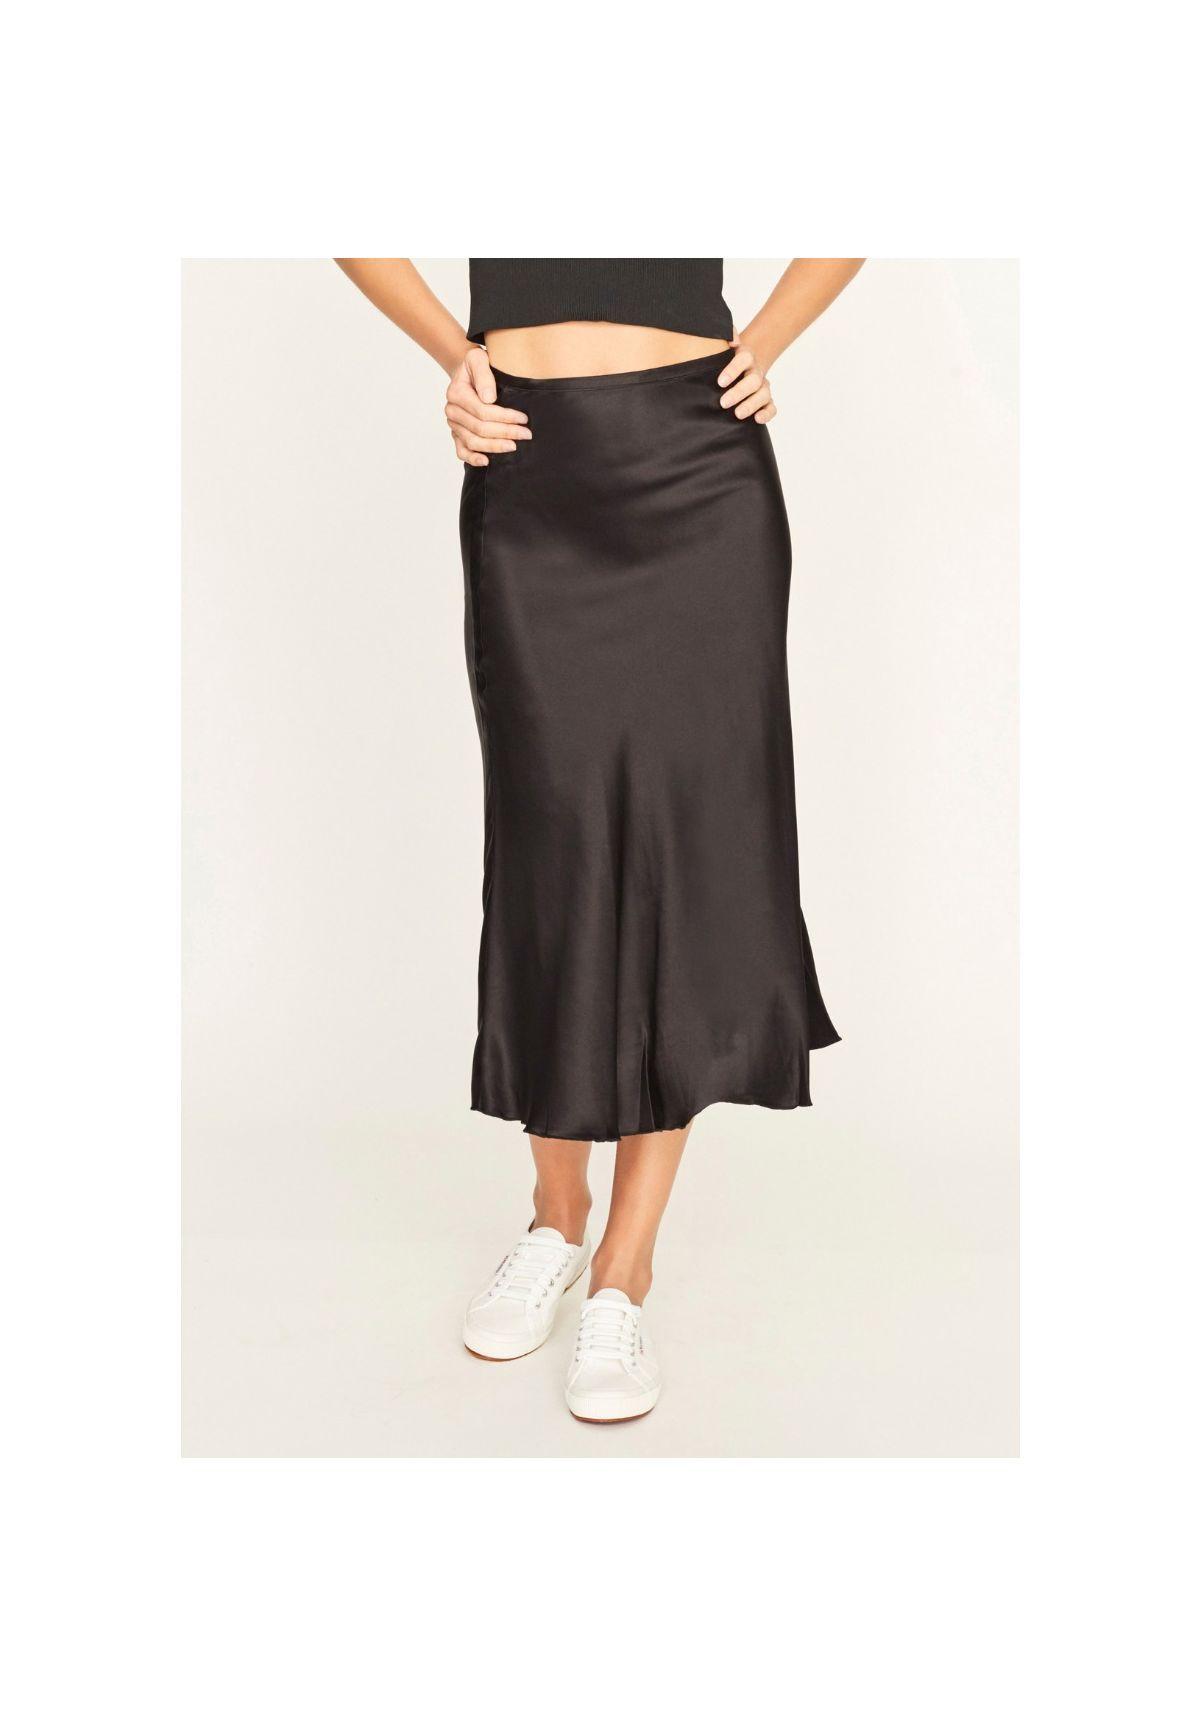 c4081c5f176e The Ellie Midi Skirt by Chosen in Black is a silk midi skirt with fluid hem